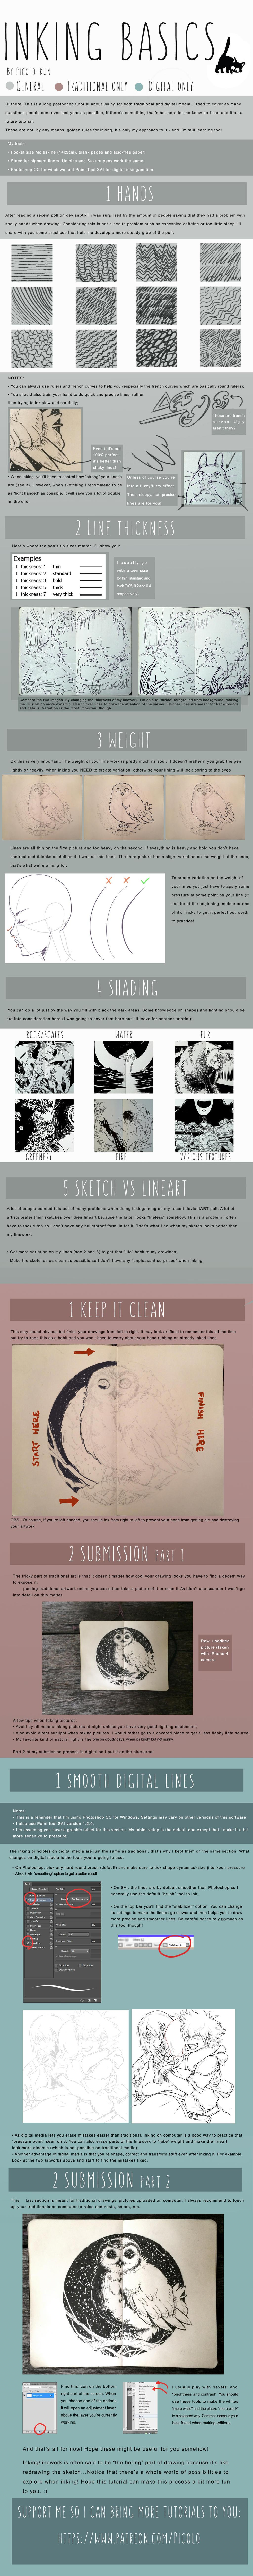 -http://img02.deviantart.net/0953/i/2015/198/1/b/inking_tutorial_by_picolo_kun-d91mq1s.jpg